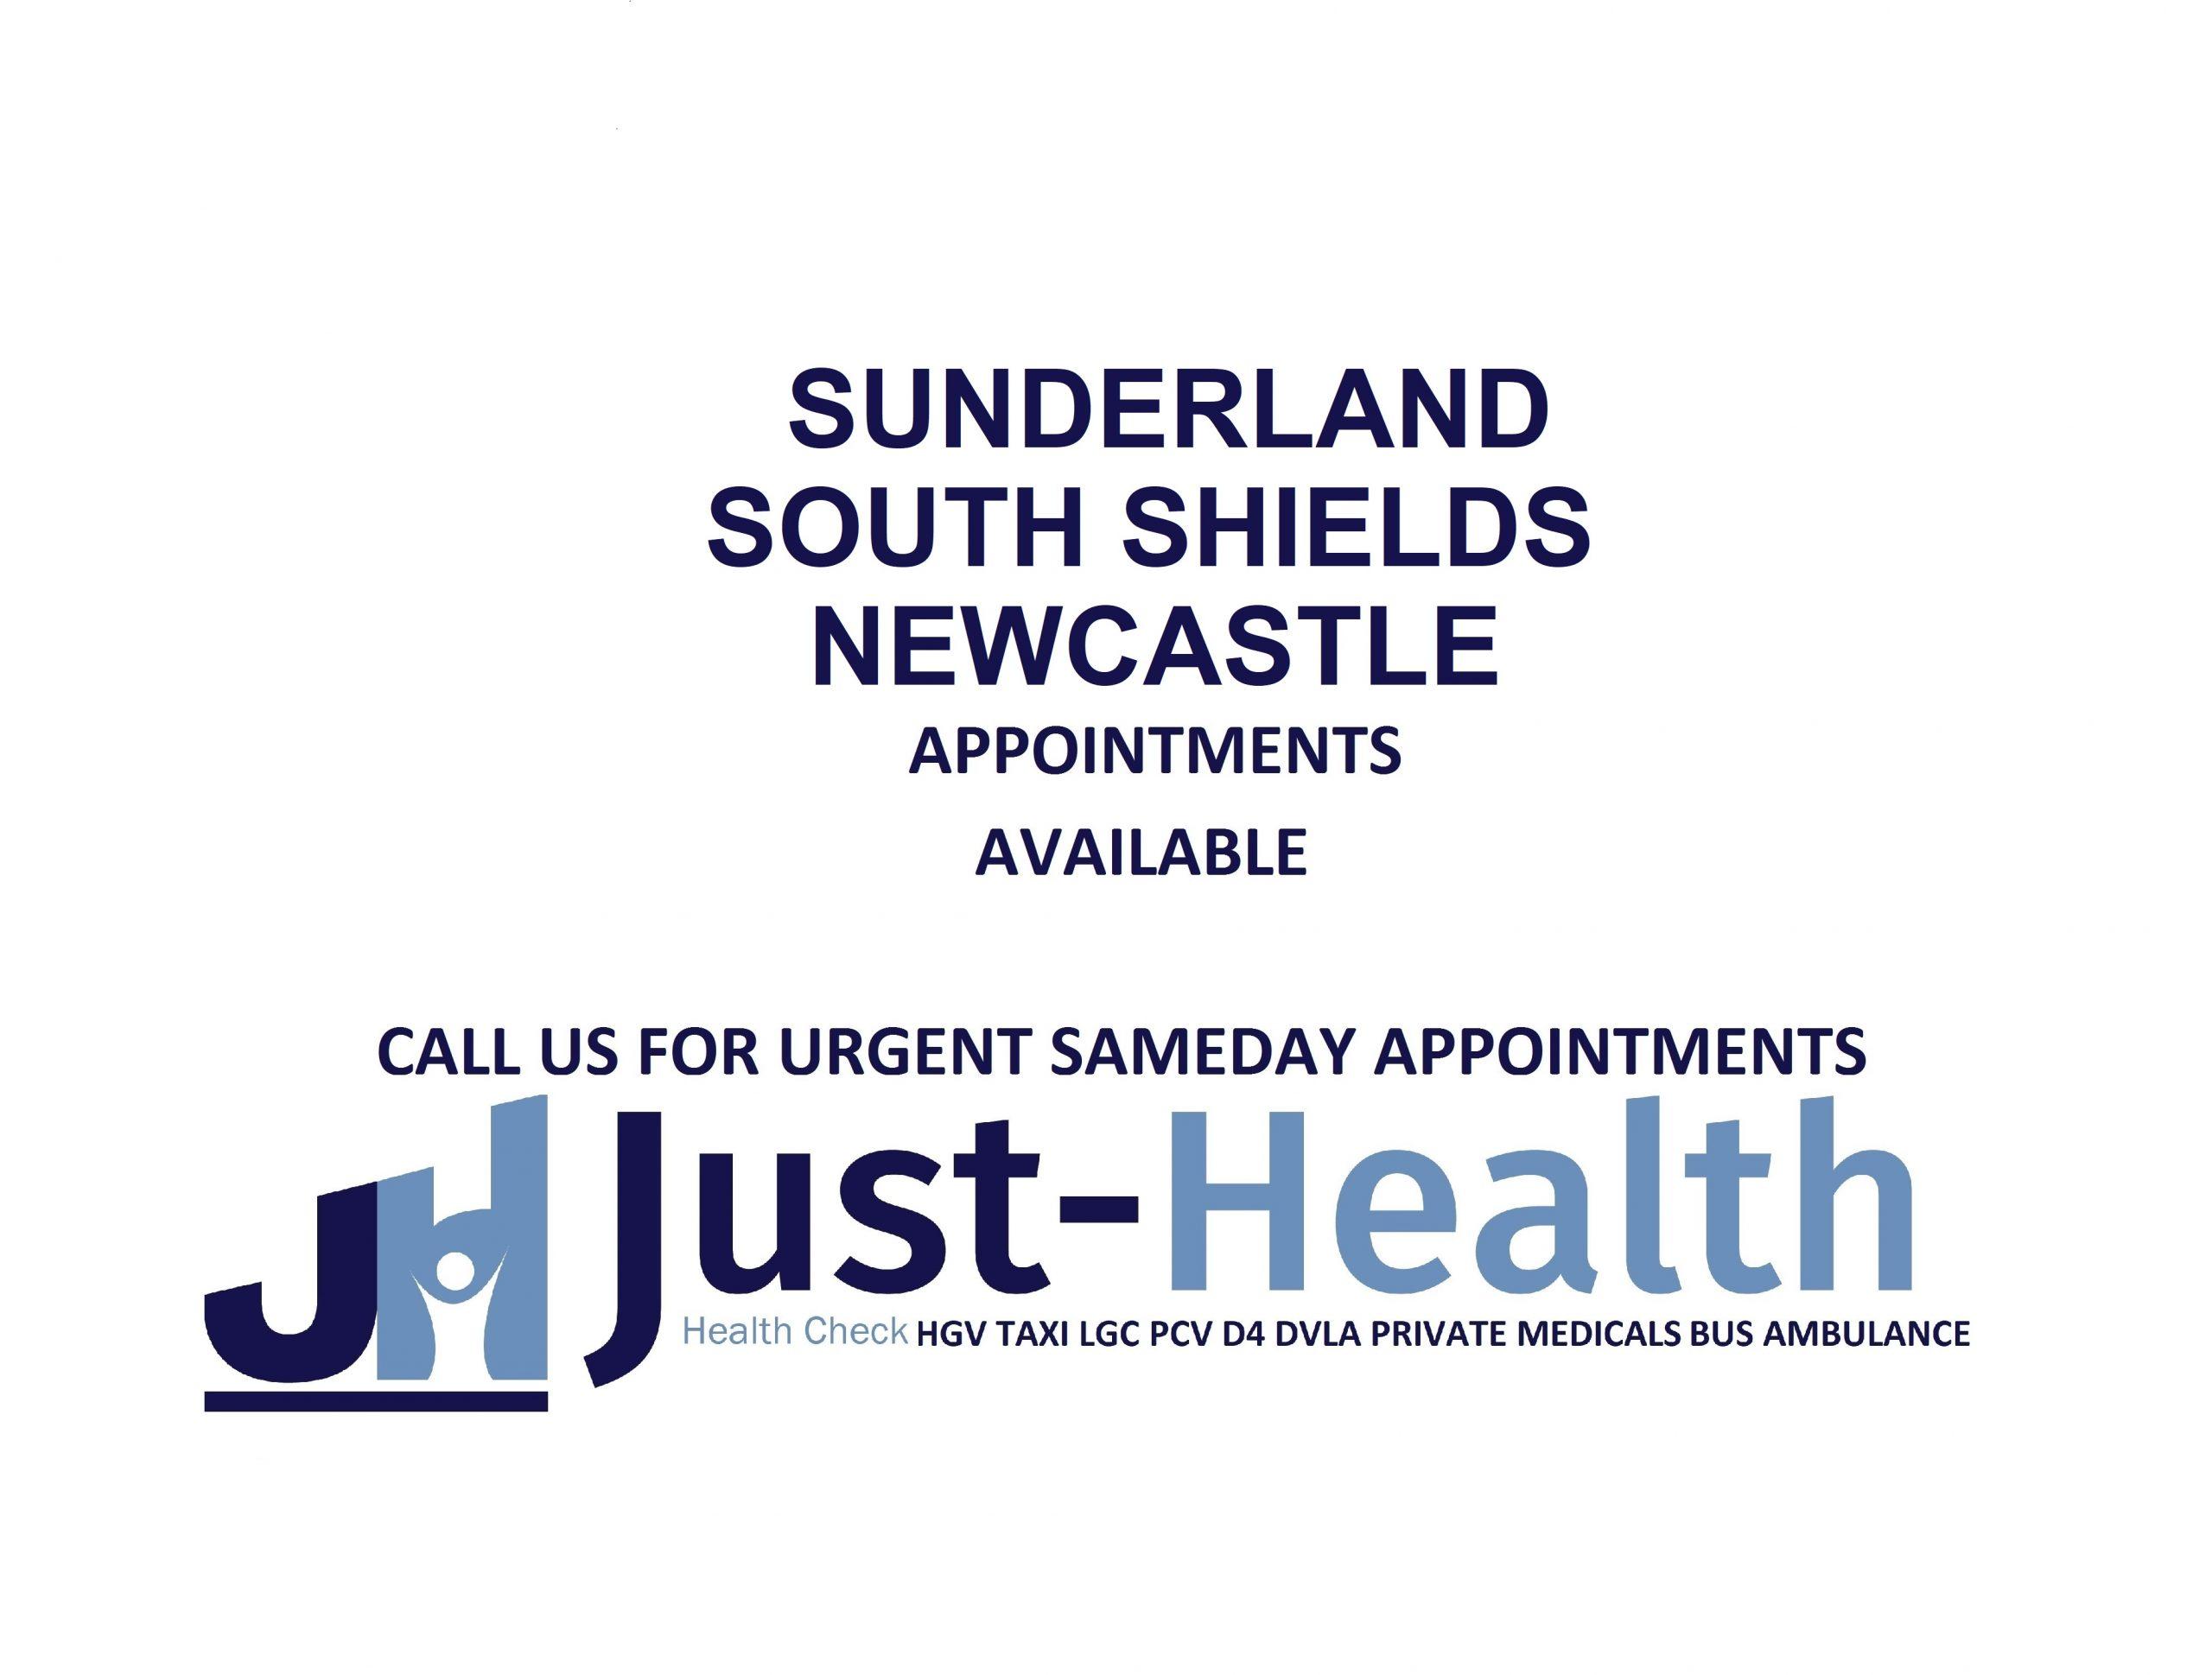 Sunderland South Shields Newcastle D4 Driver medicals hgv pcv c1